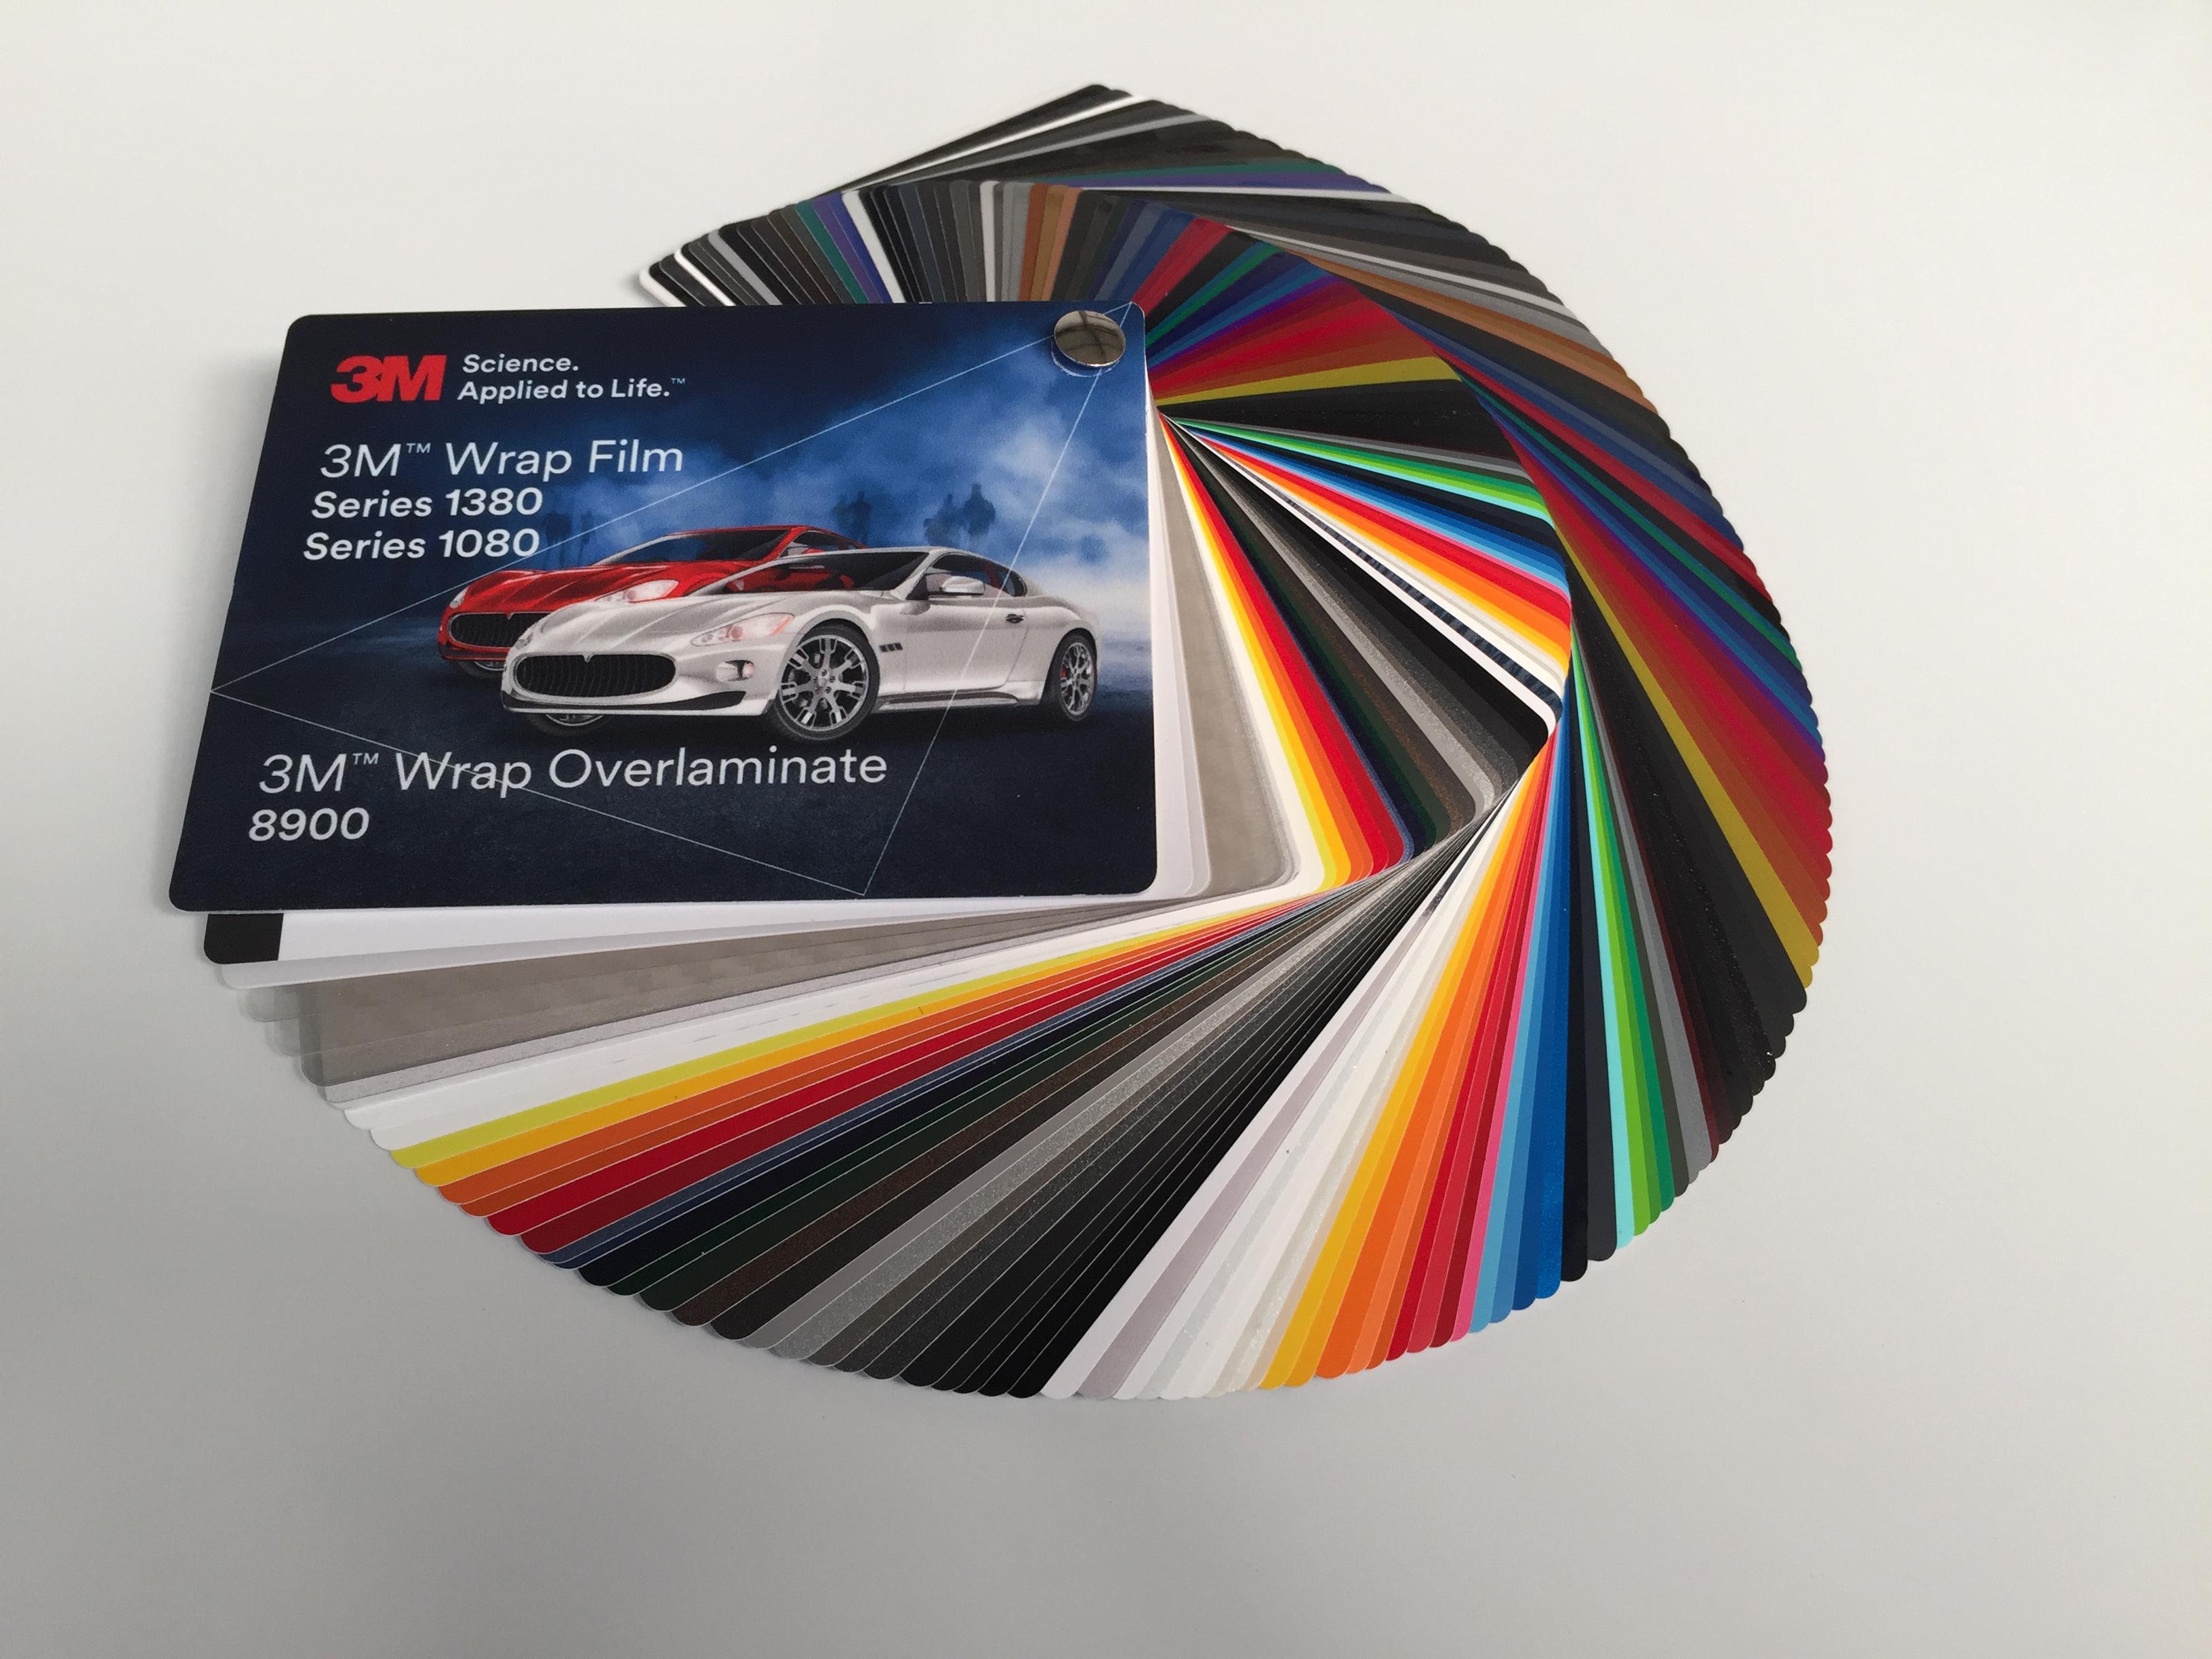 3m farbf cher 1080 1380 8900 car wrapping folien und overlaminate neue farben. Black Bedroom Furniture Sets. Home Design Ideas